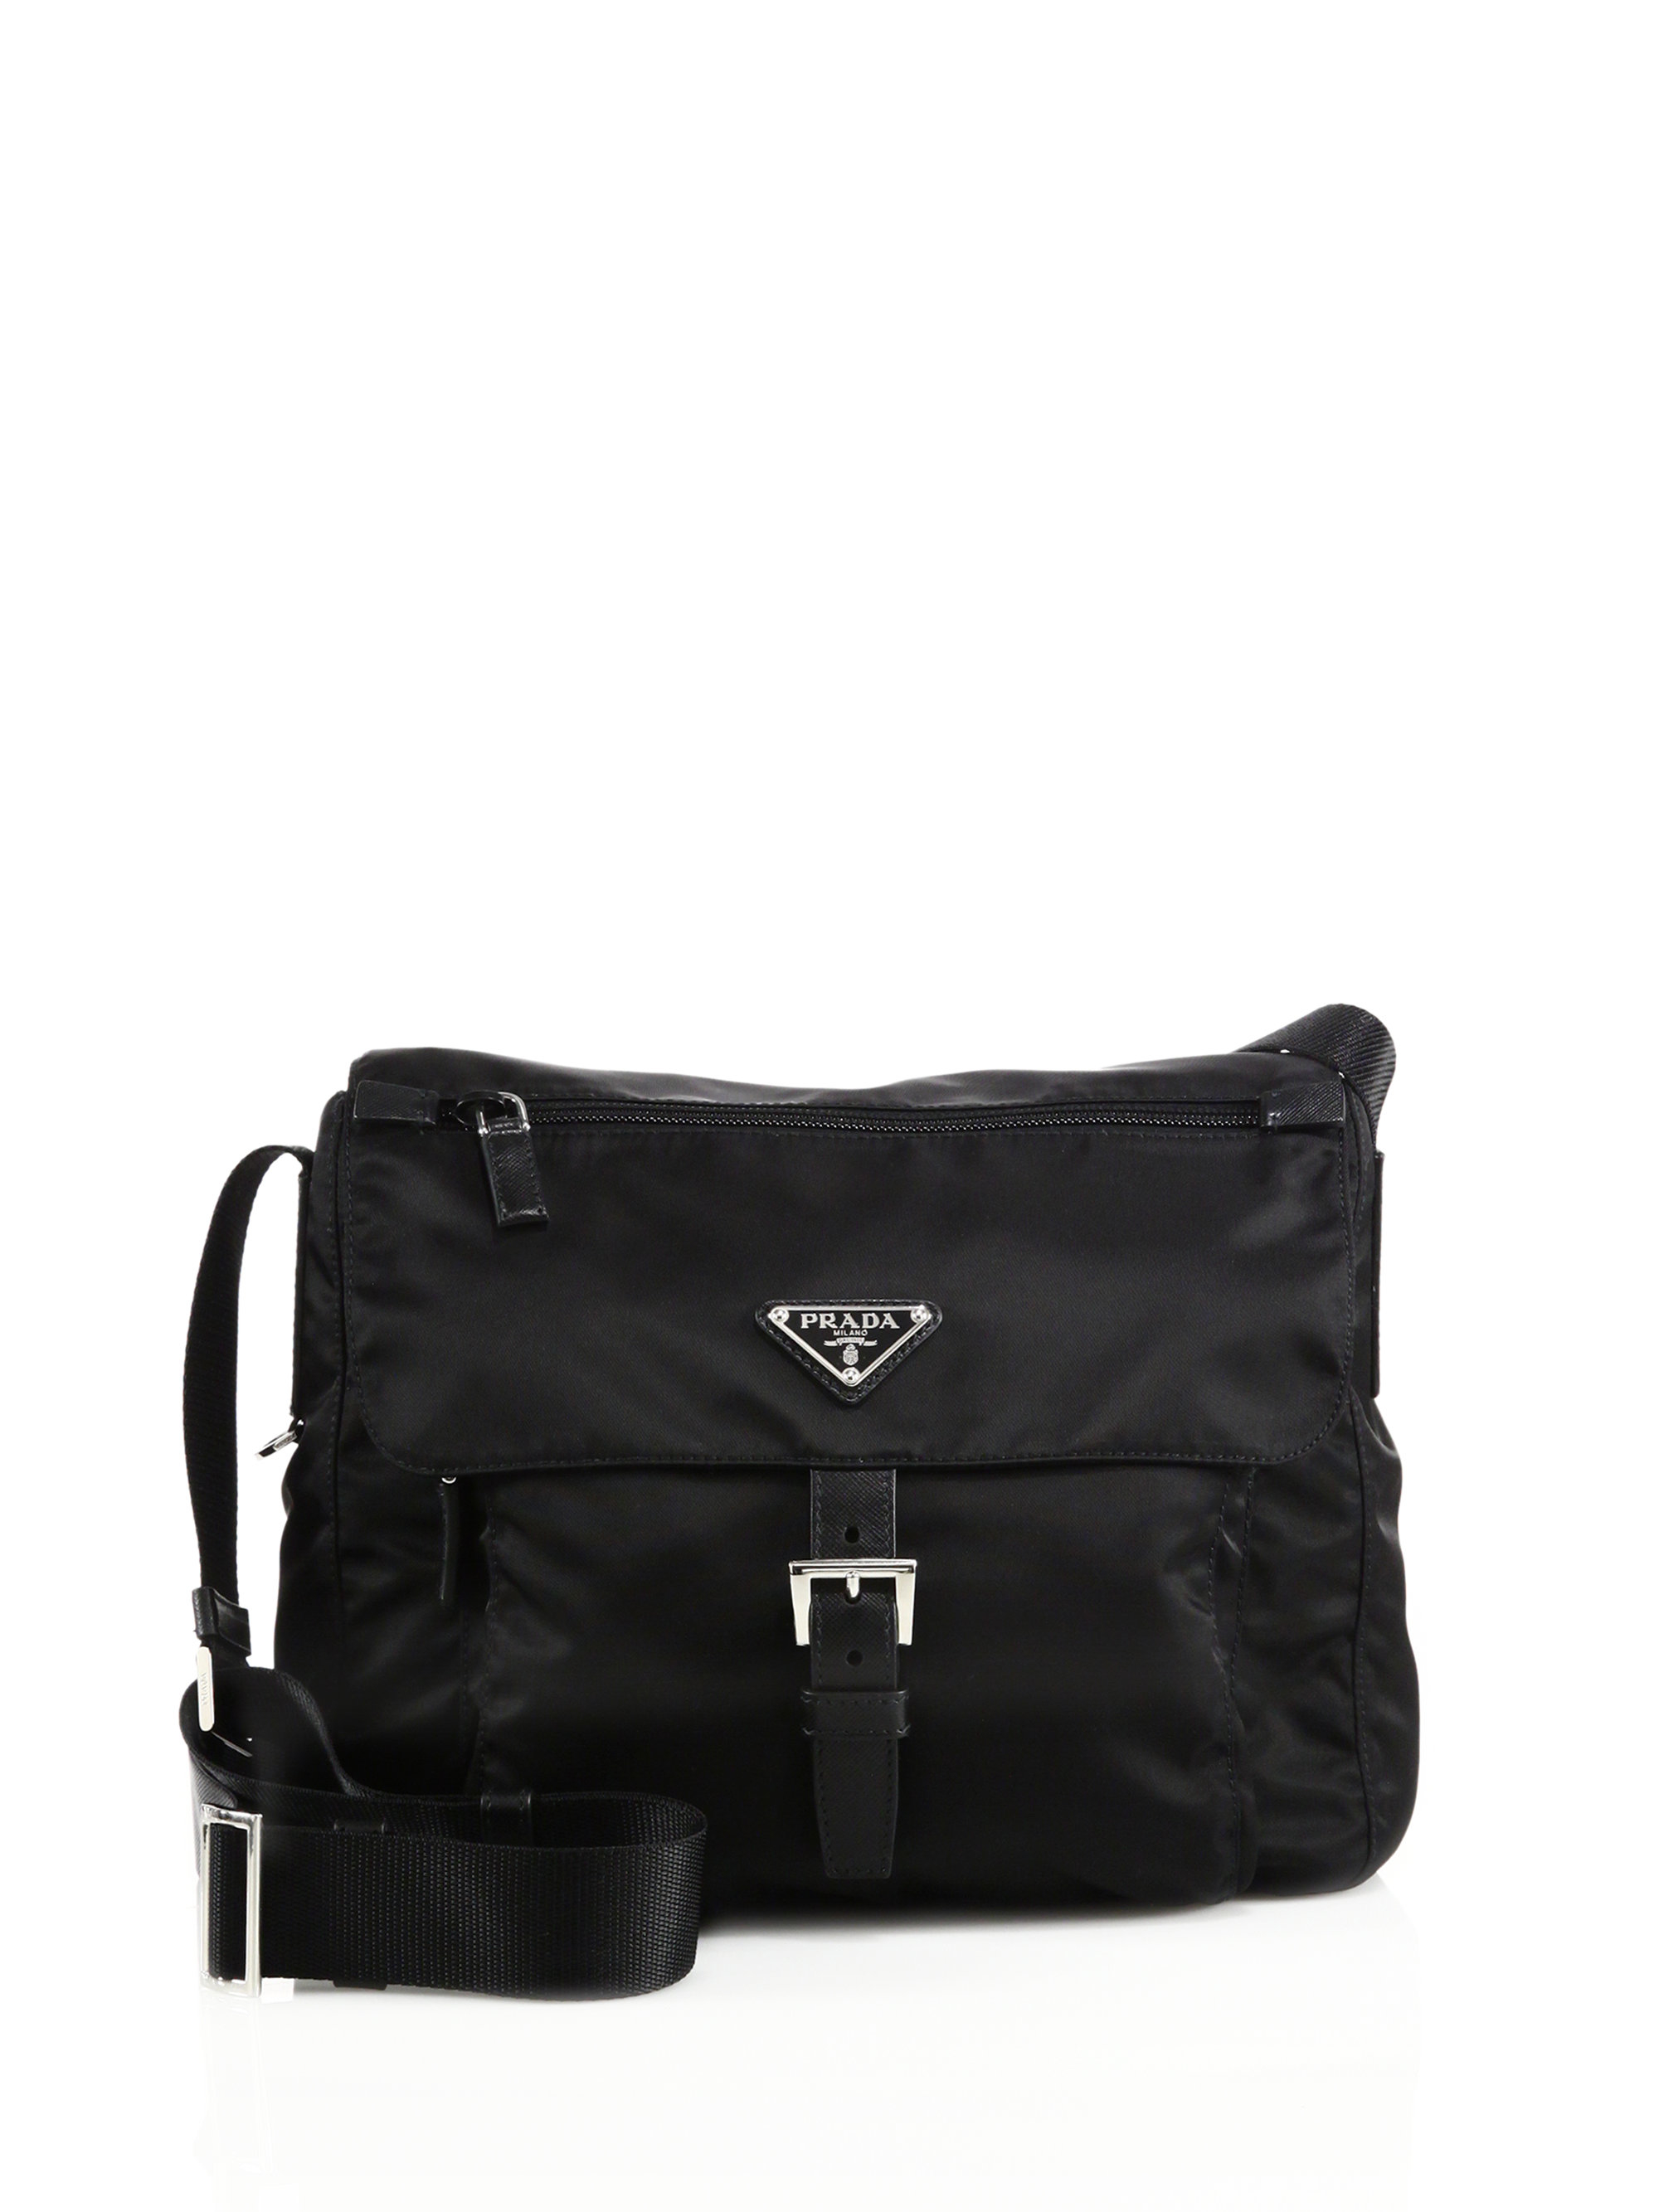 prada handbag prices - Prada Nylon & Leather Crossbody Bag in Black | Lyst